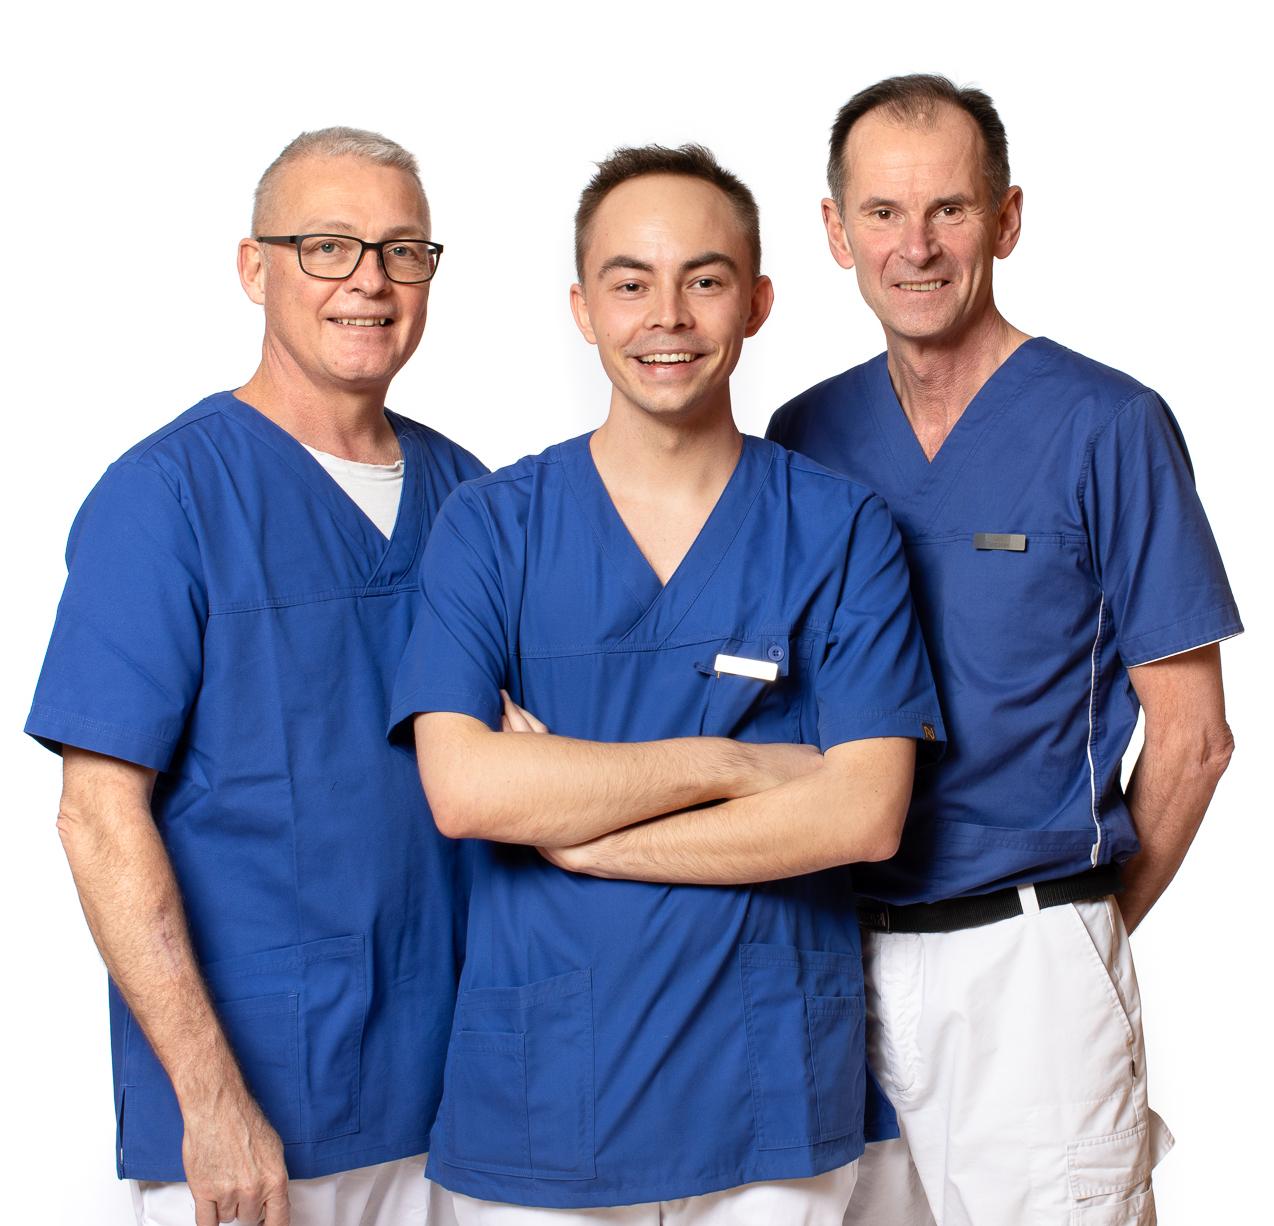 Våra tandläkare